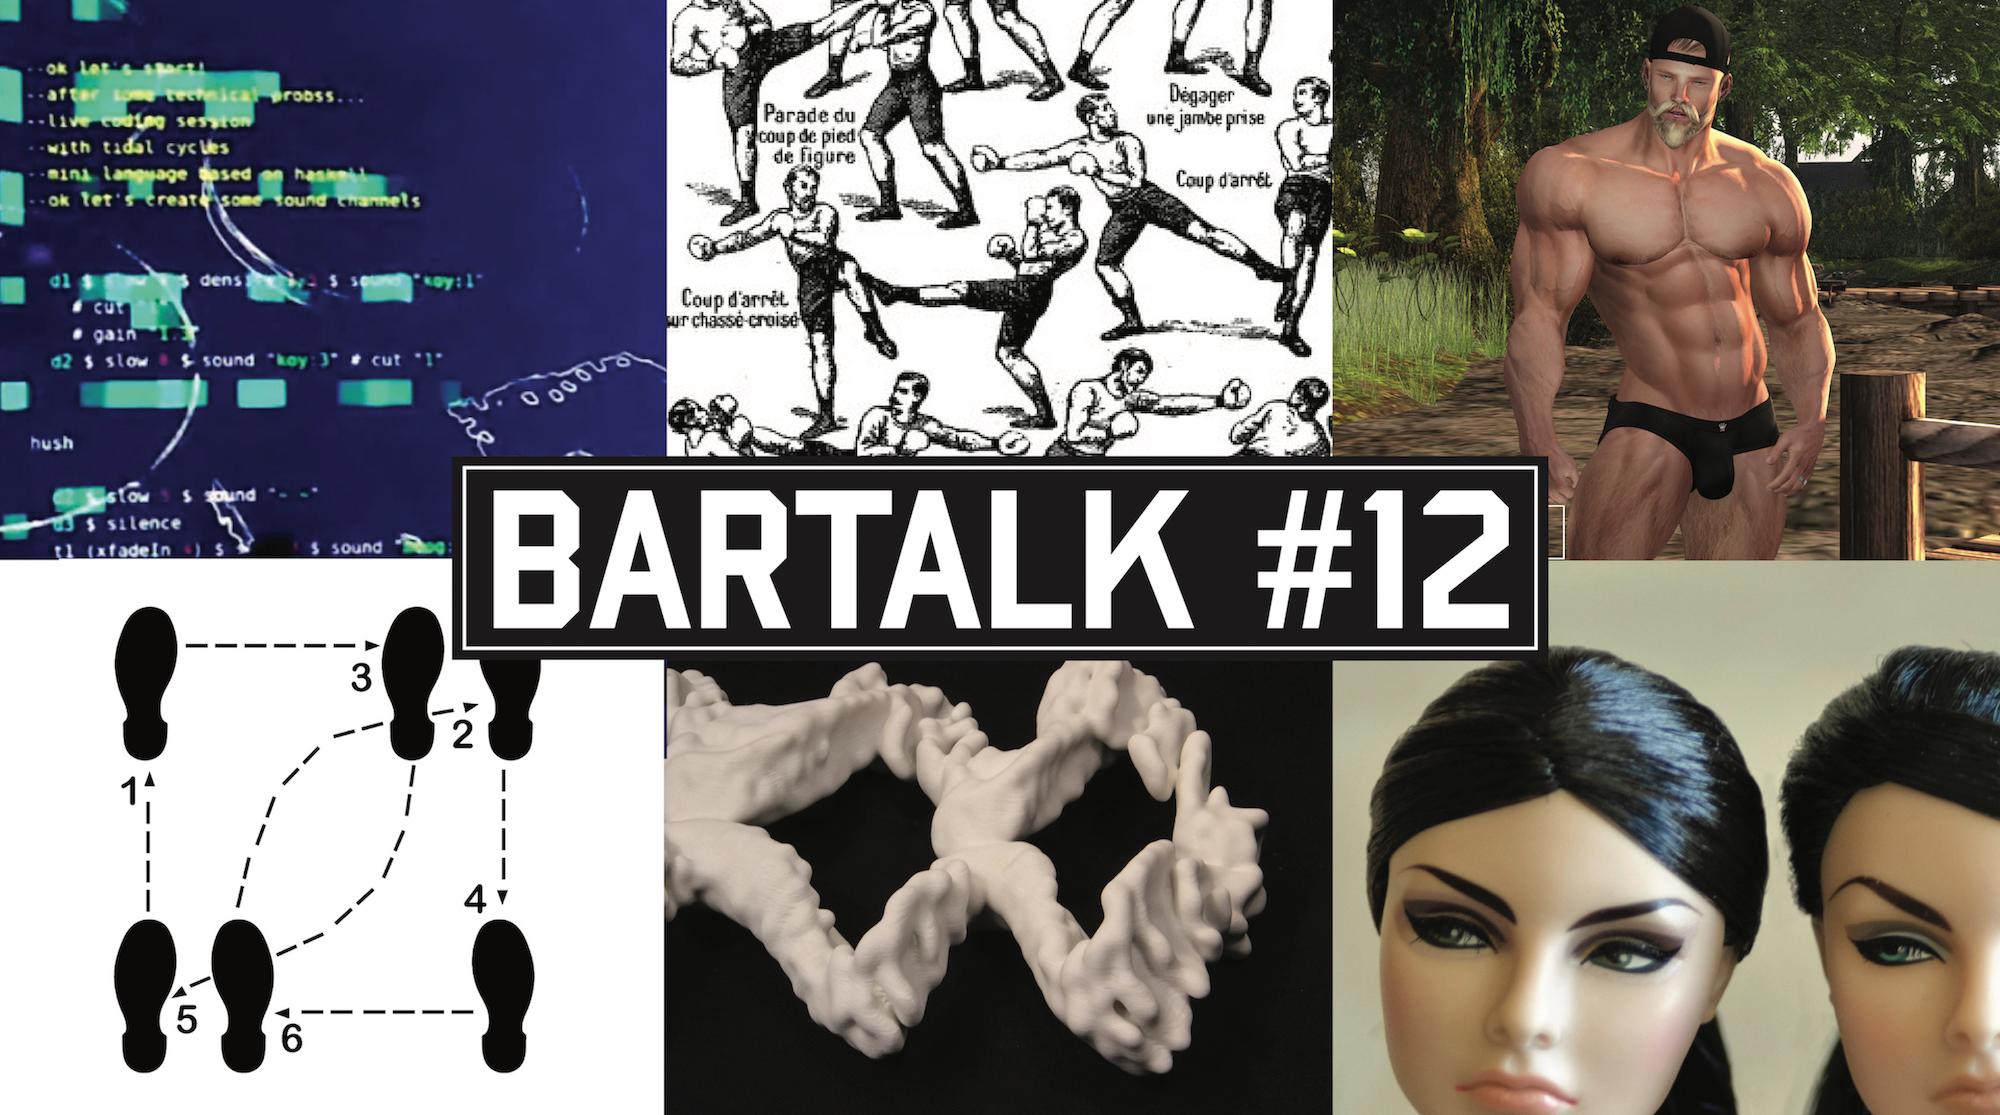 BARTALK 12